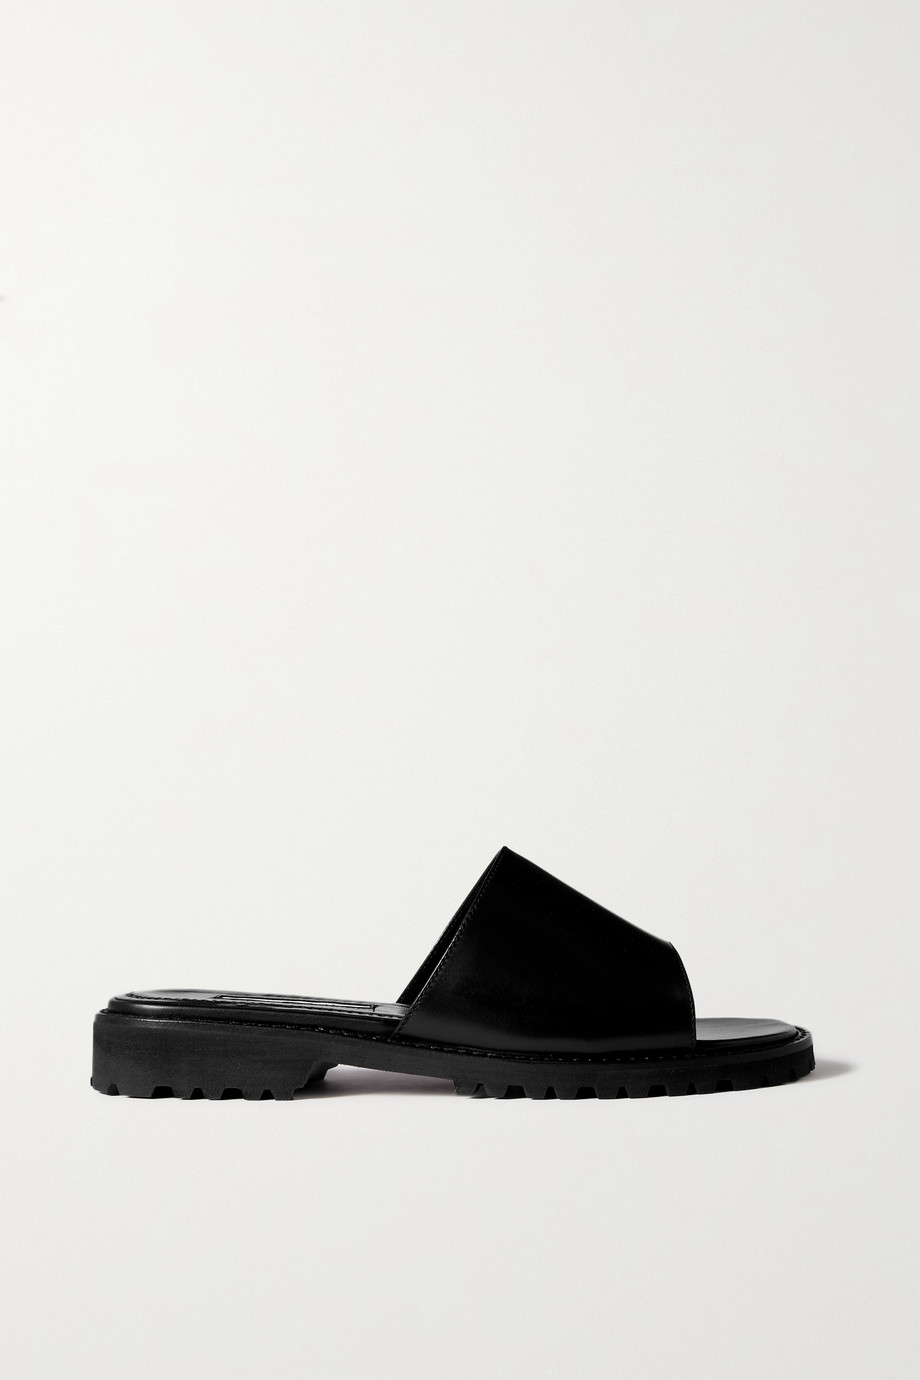 Manolo Blahnik Campaia leather slides